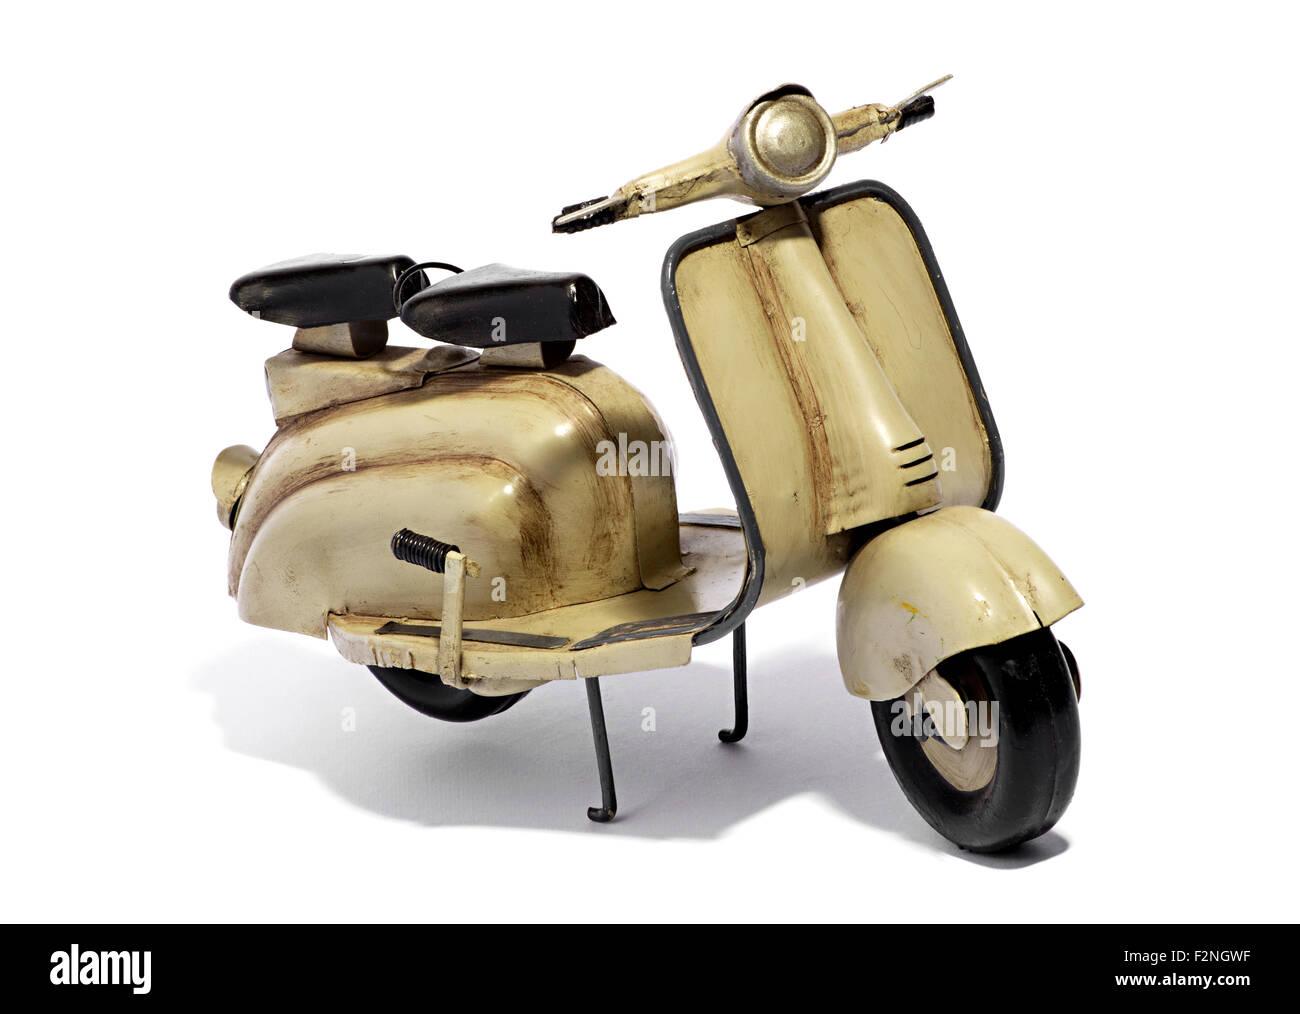 Model of Motorized Scooter - Lambretta - - Stock Image